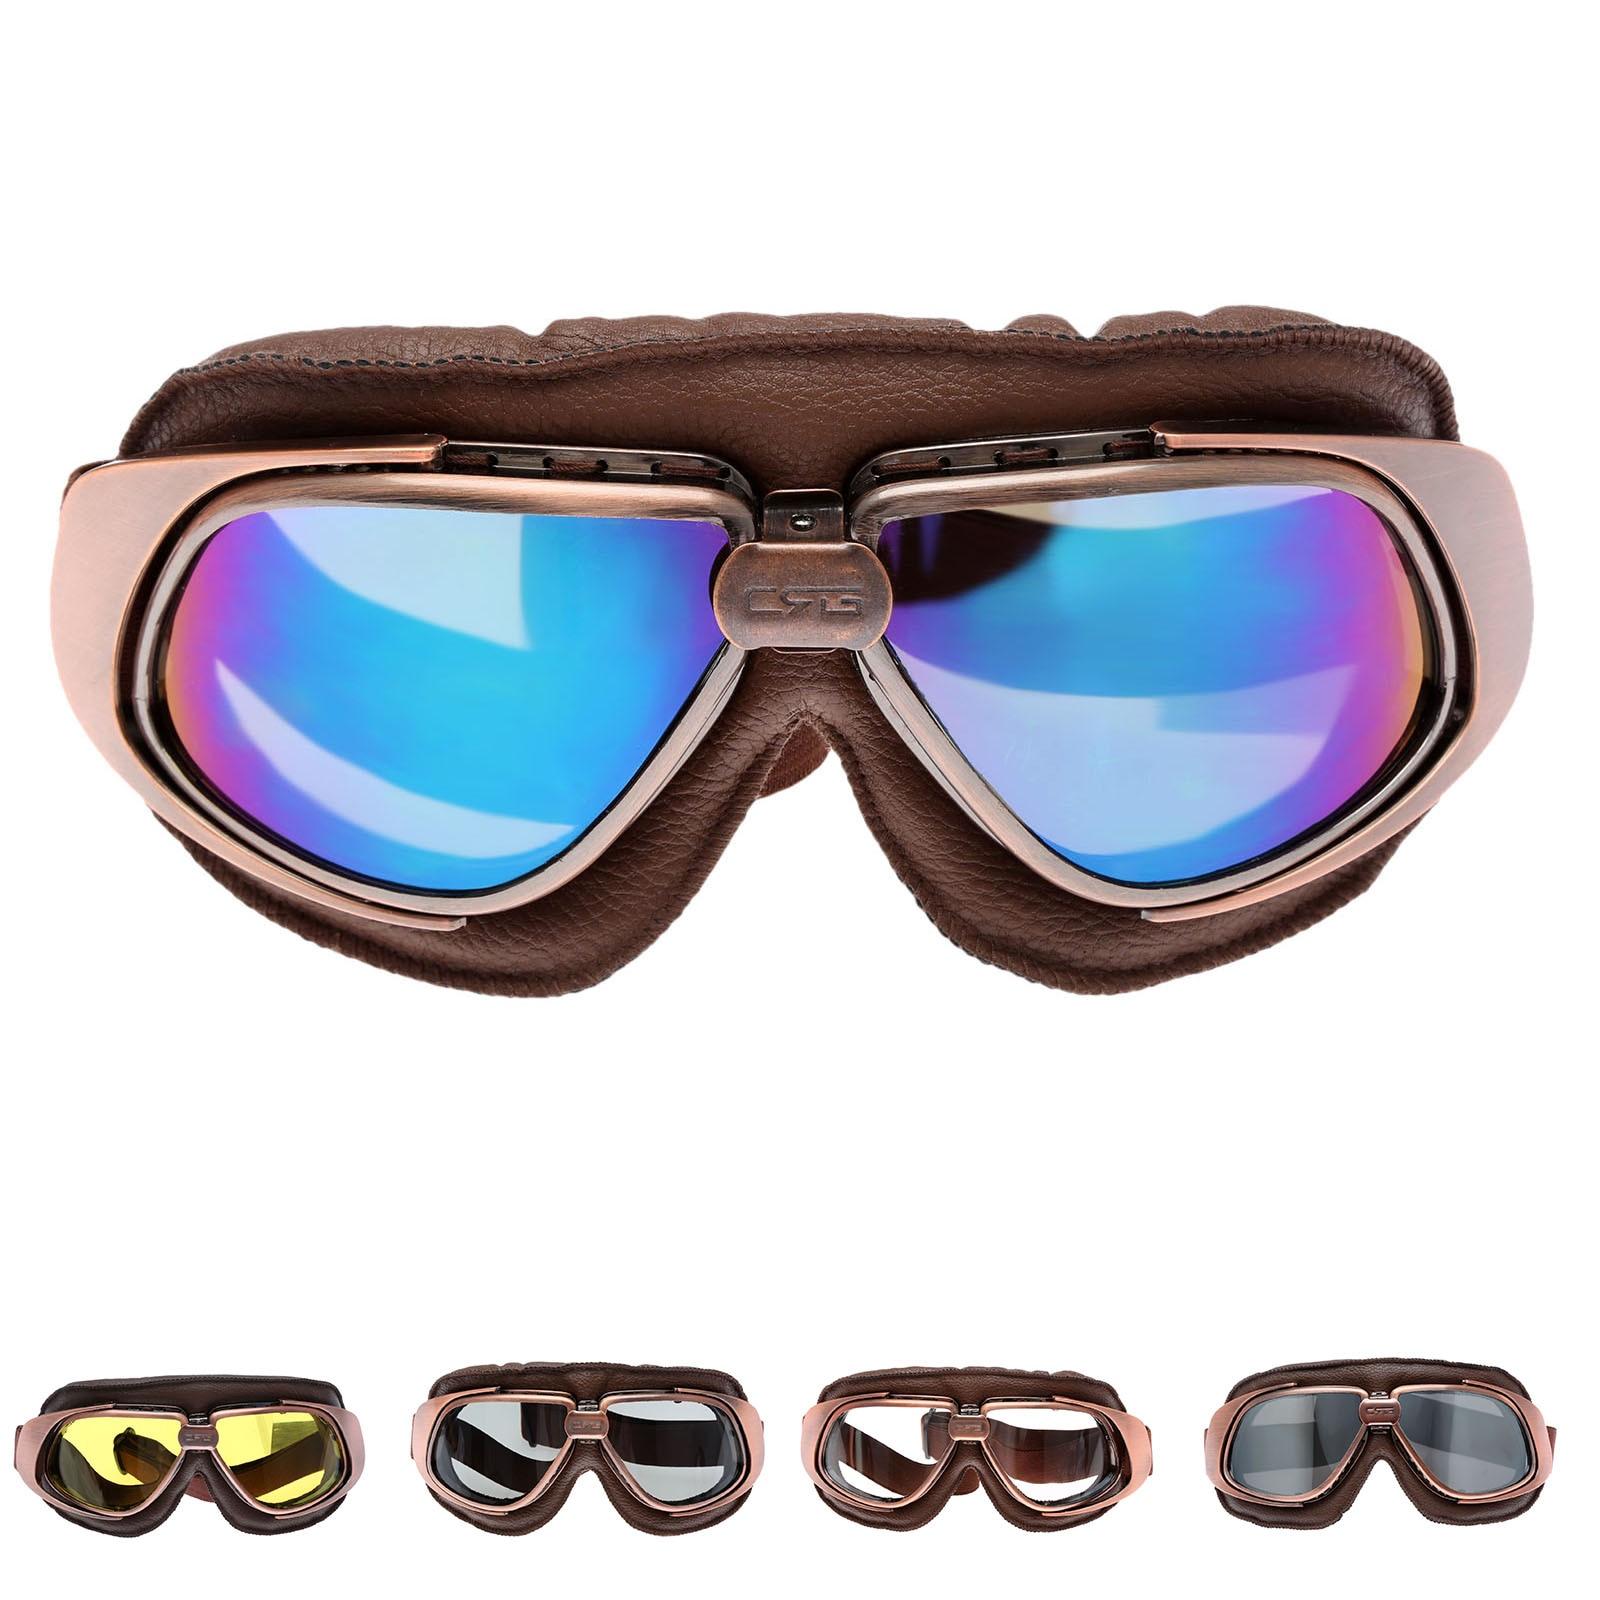 Vintage Motorcycle Goggles Smoking Steampunk Motocross Helmet Glasses UV Protection Sport Ski Skate Goggle Sunglasses For Harley